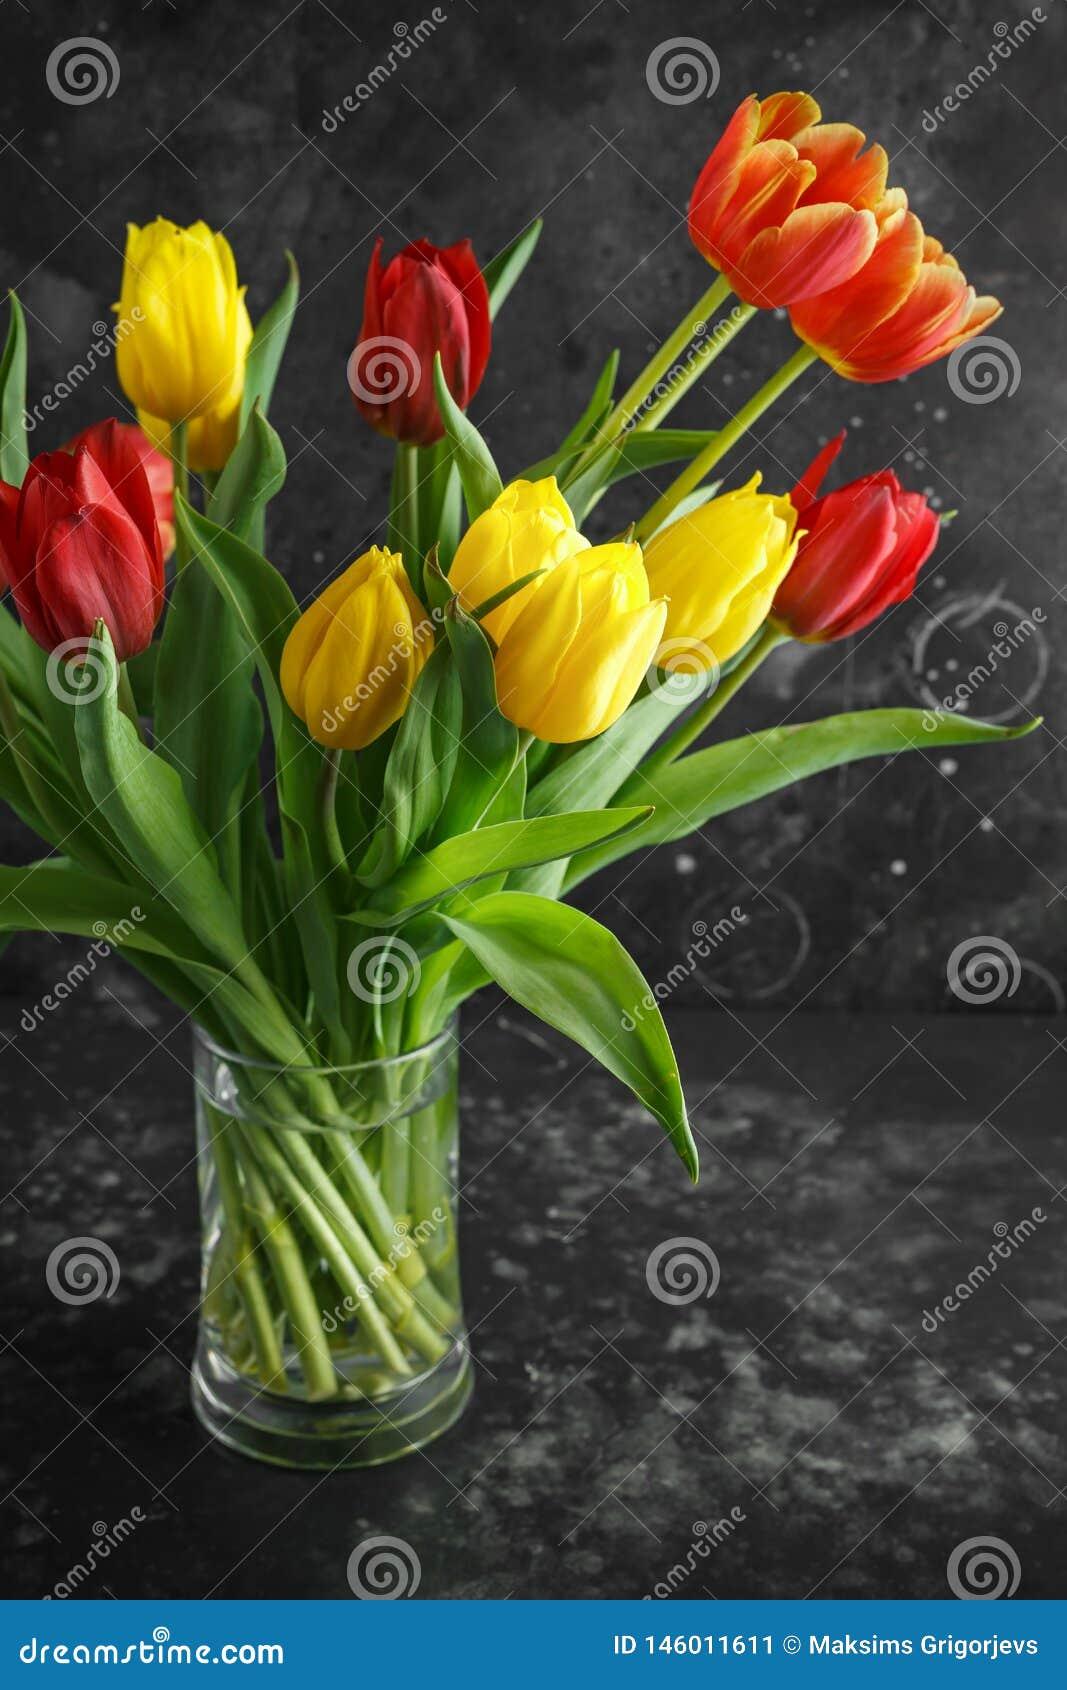 Bouqet romântico das tulipas no fundo escuro rústico